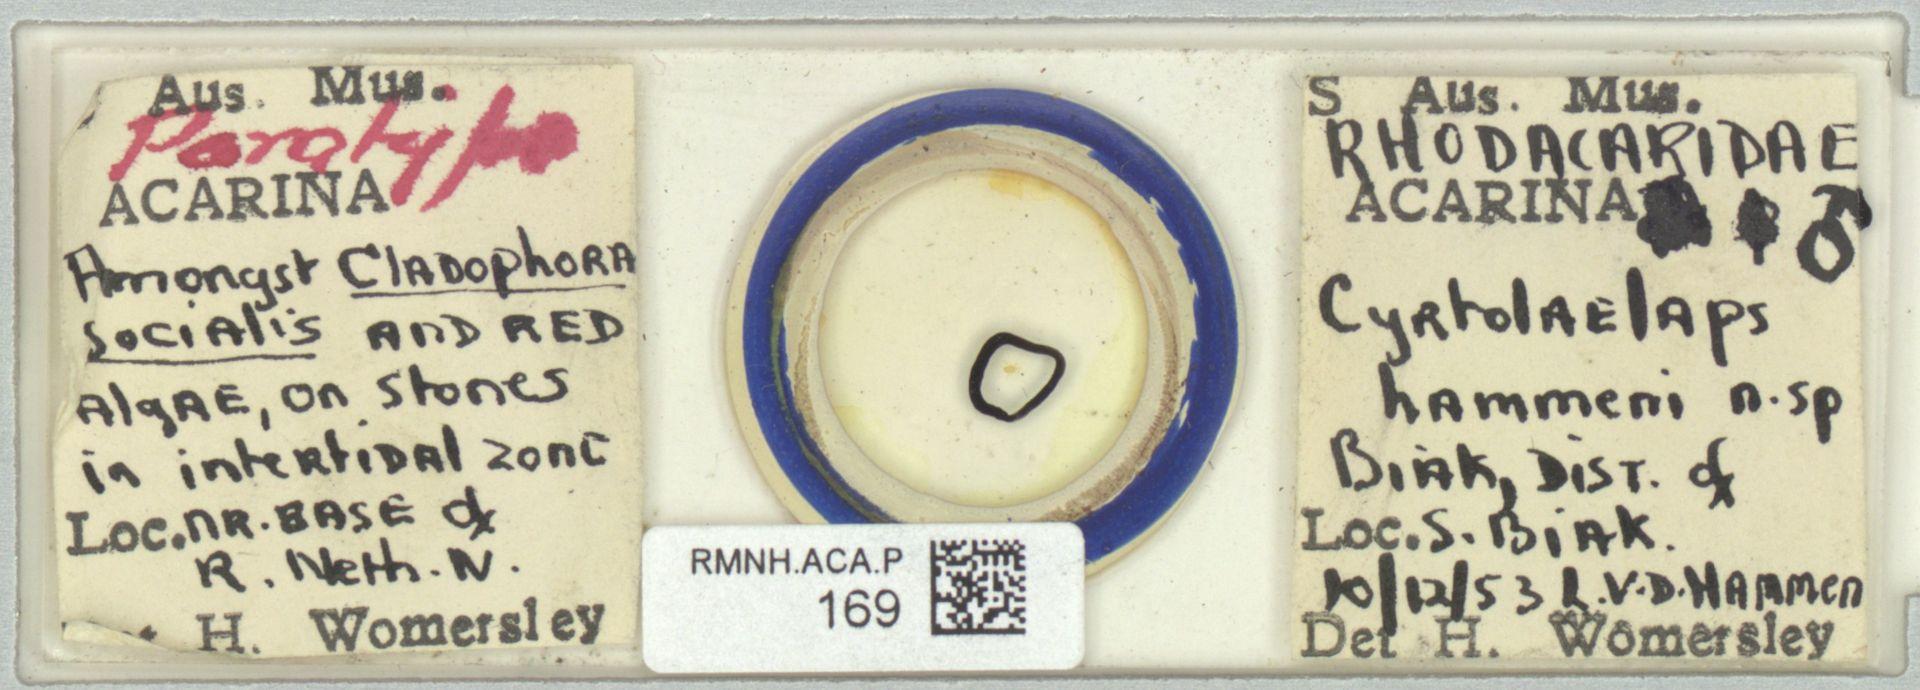 RMNH.ACA.P.169   Cyrtolaelaps hammeni Womersley